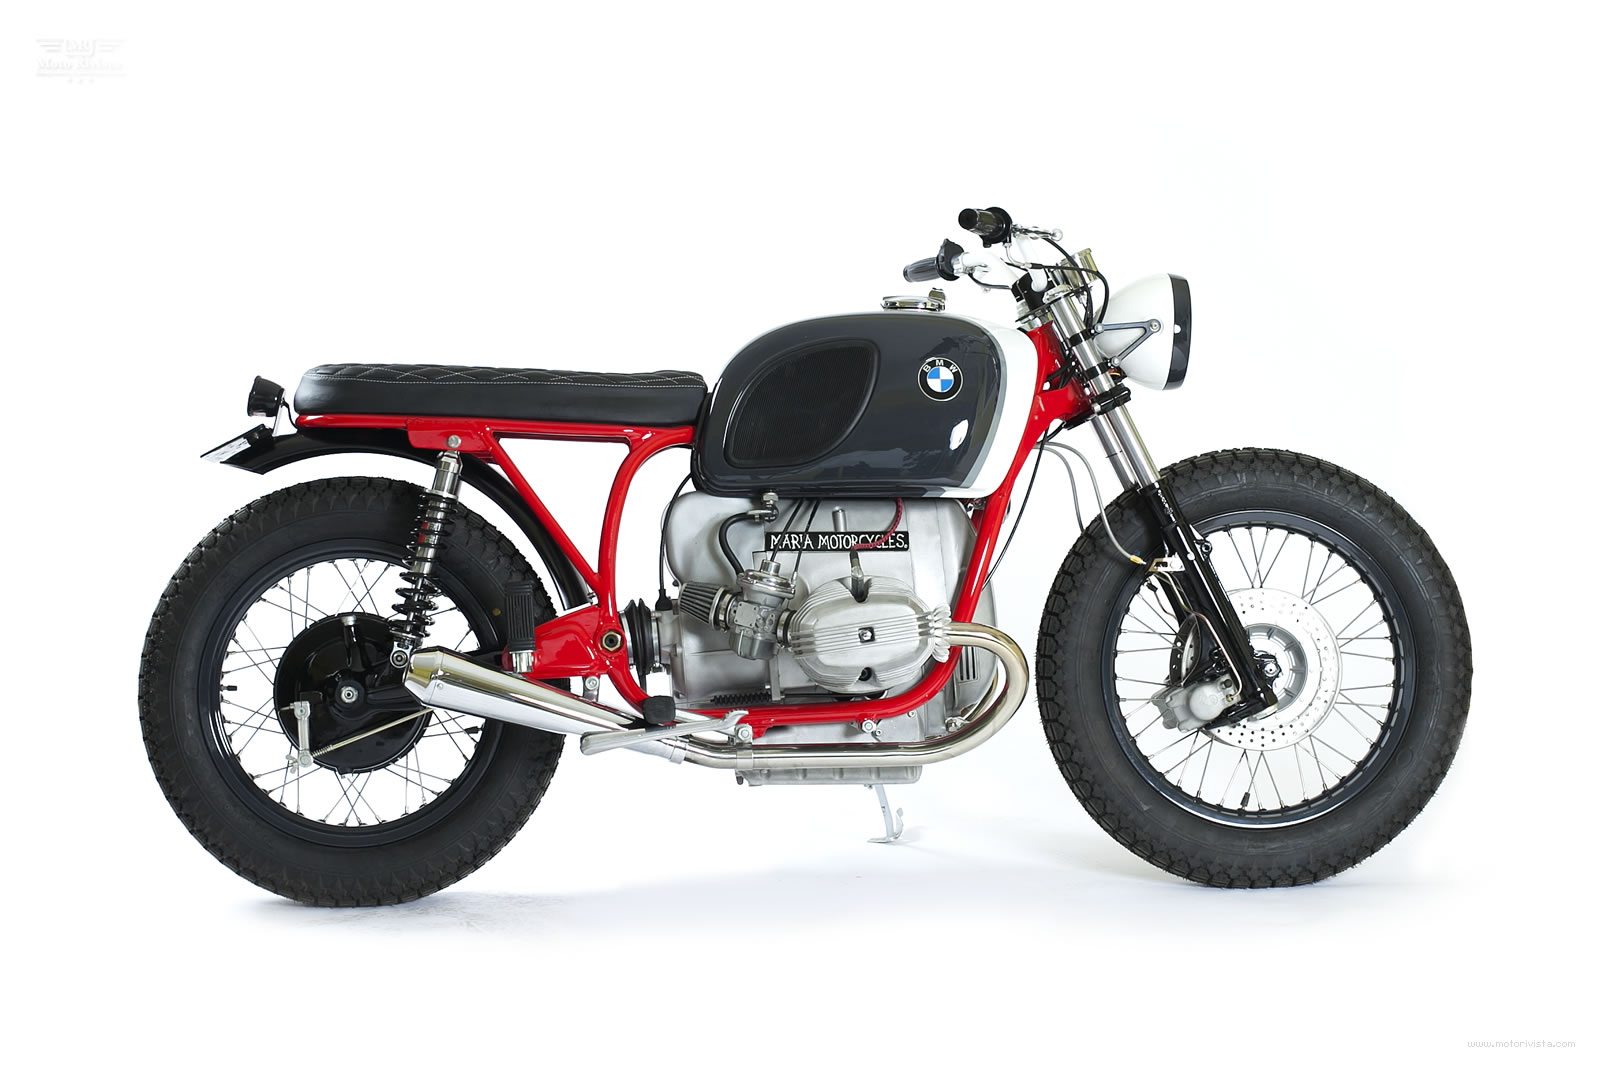 BMW-R75-Maria-Riding-Company-1